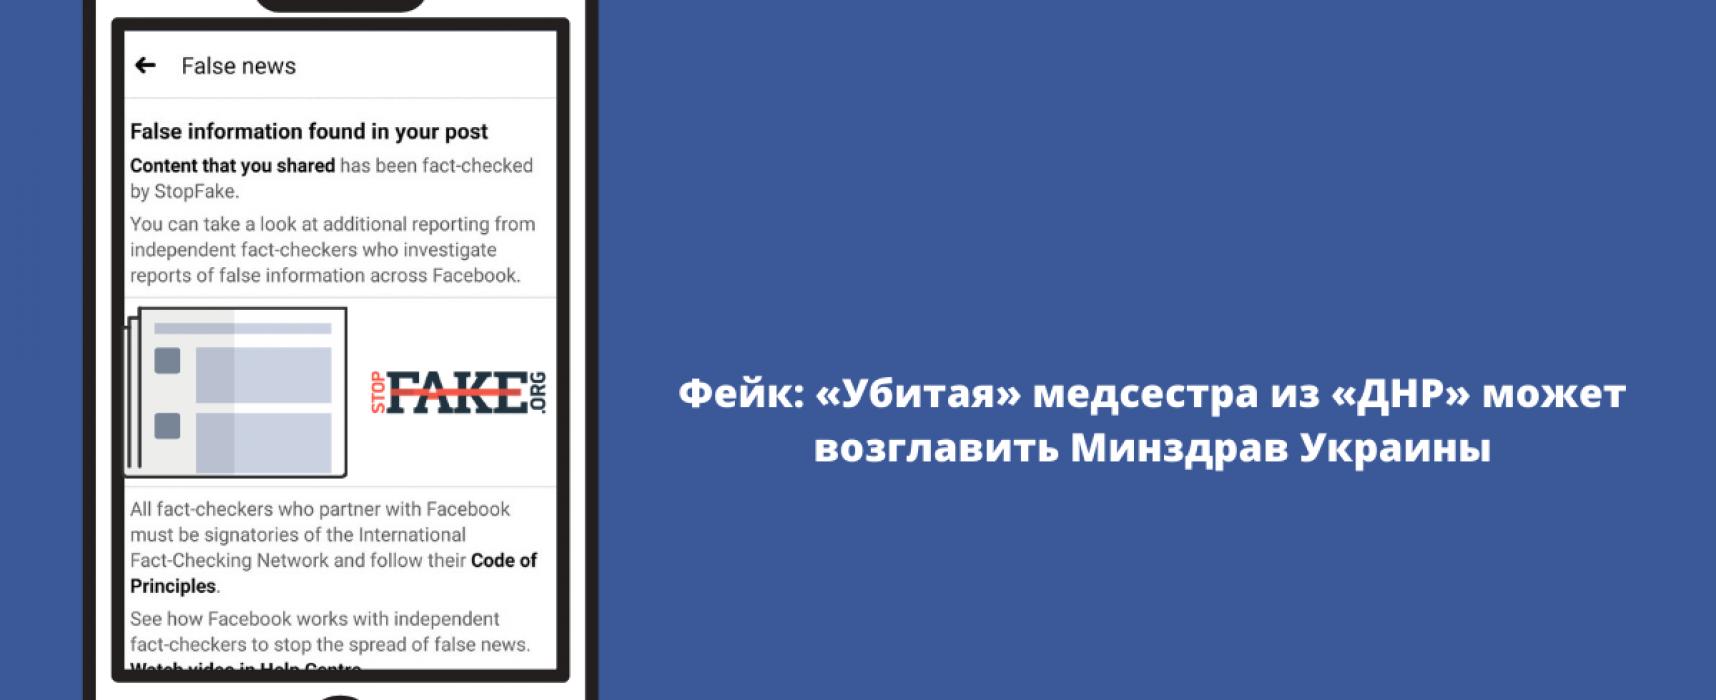 Фейк: «Убита» медсестра з «ДНР» може очолити МОЗ України